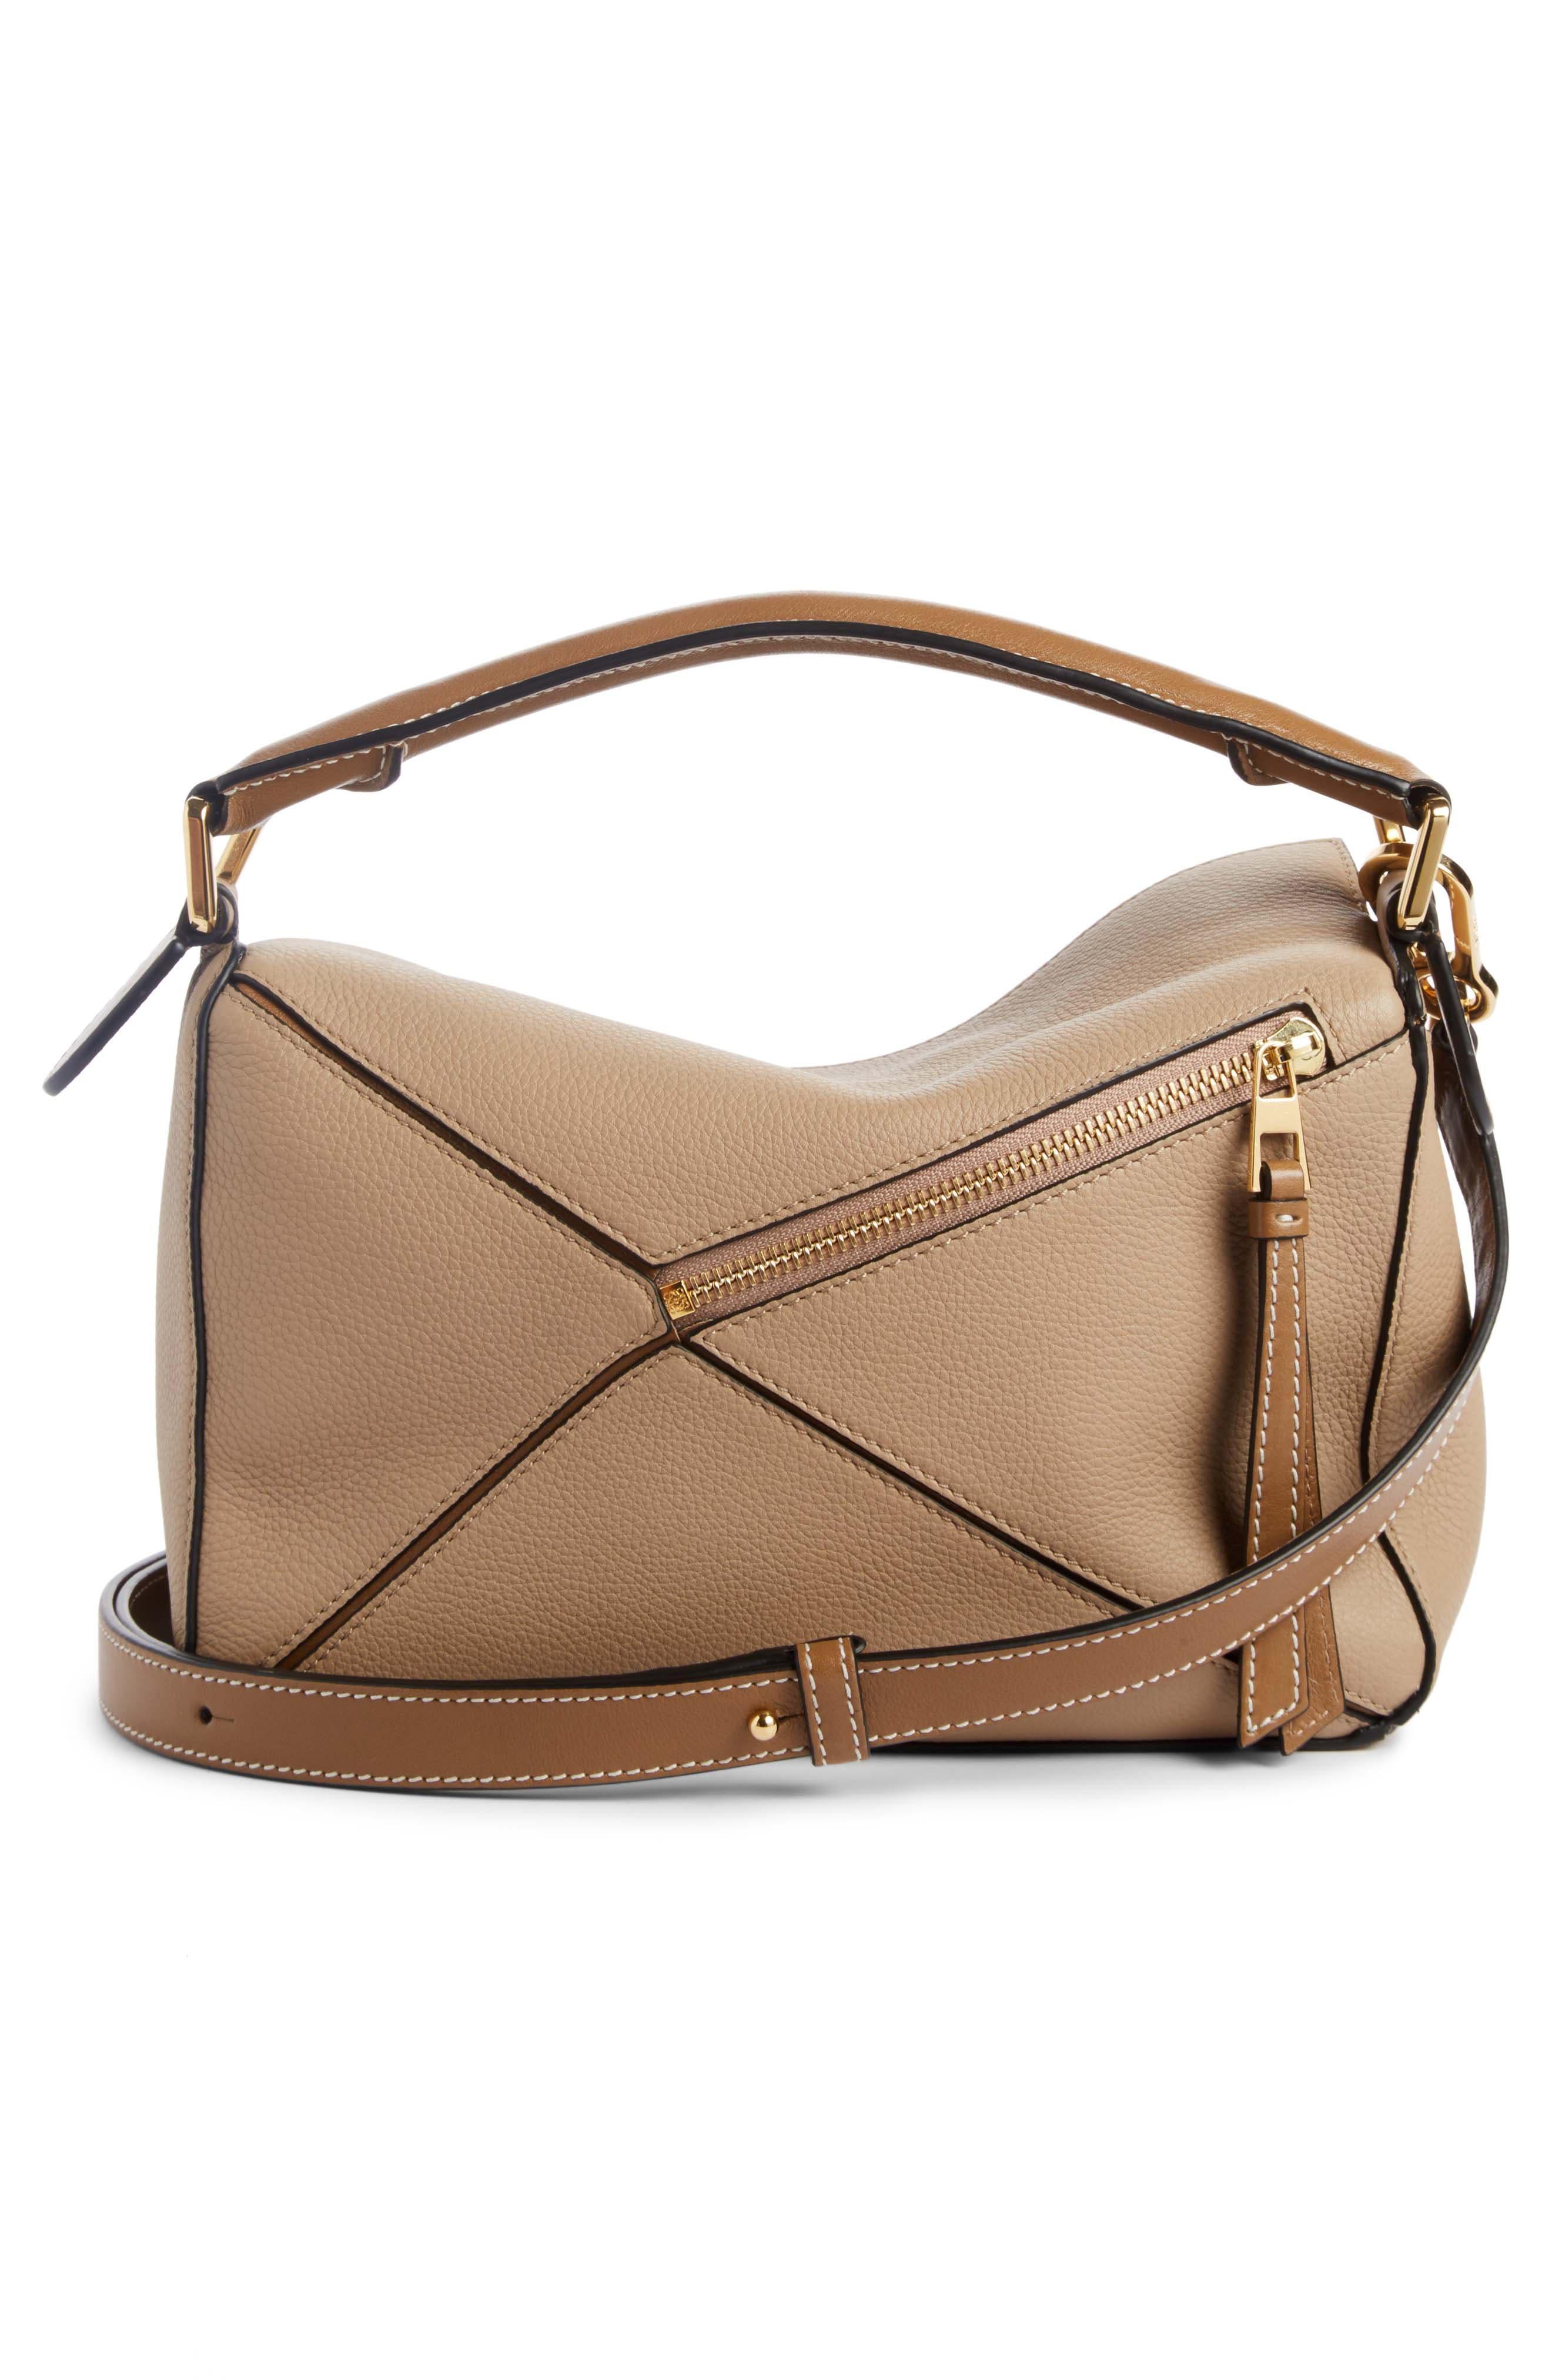 Medium Puzzle Calfskin Leather Shoulder Bag,                             Alternate thumbnail 2, color,                             200